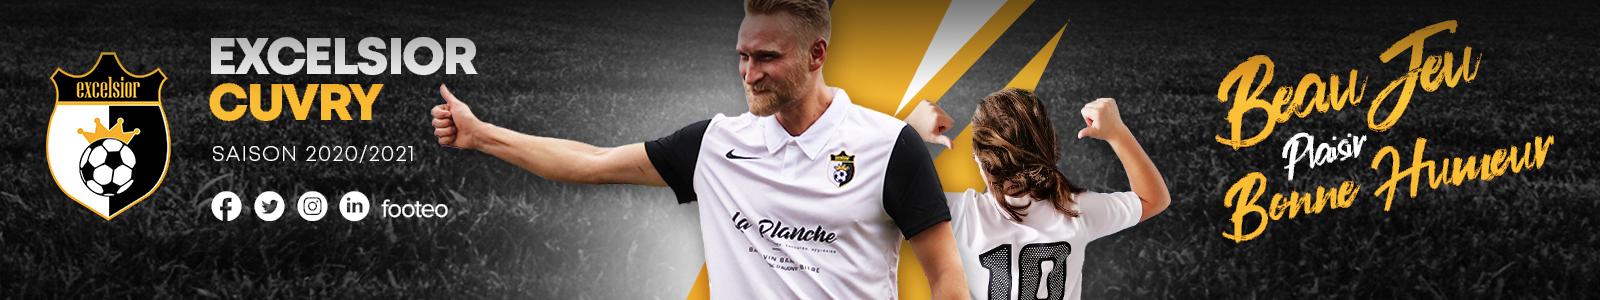 EXCELSIOR Cuvry : site officiel du club de foot de CUVRY - footeo